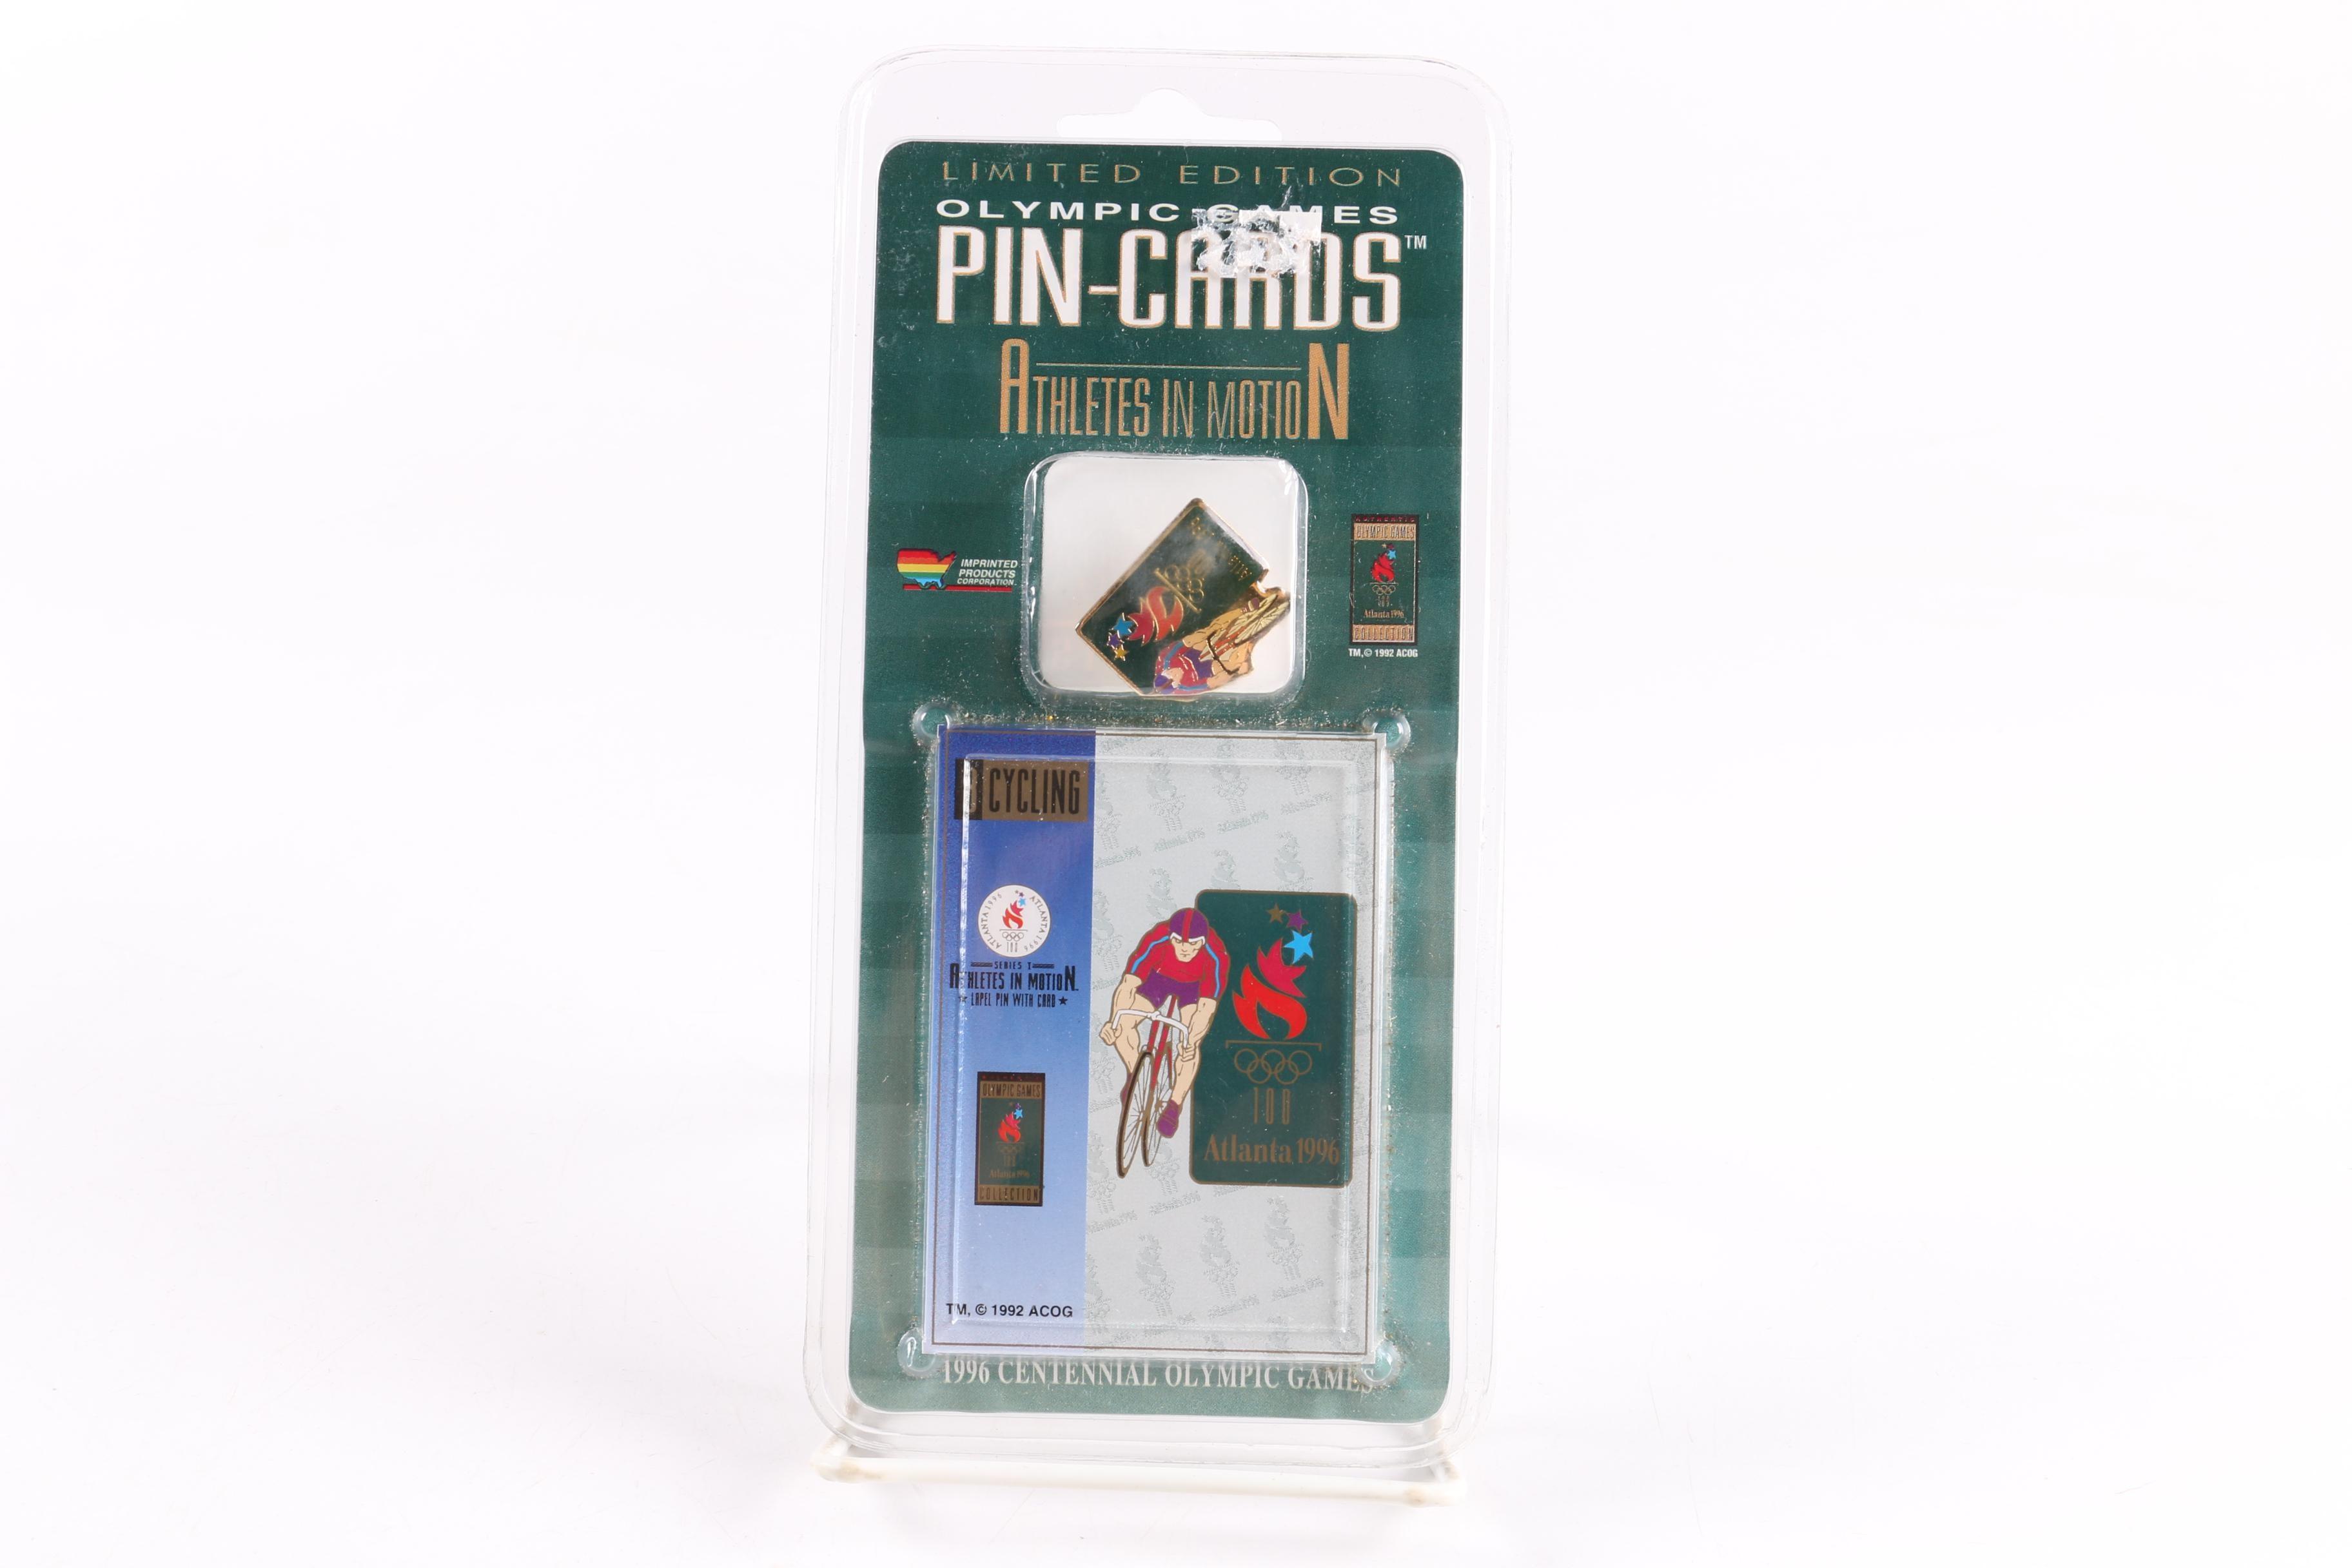 1996 Summer Olympics Commemorative Cycling Lapel Pin